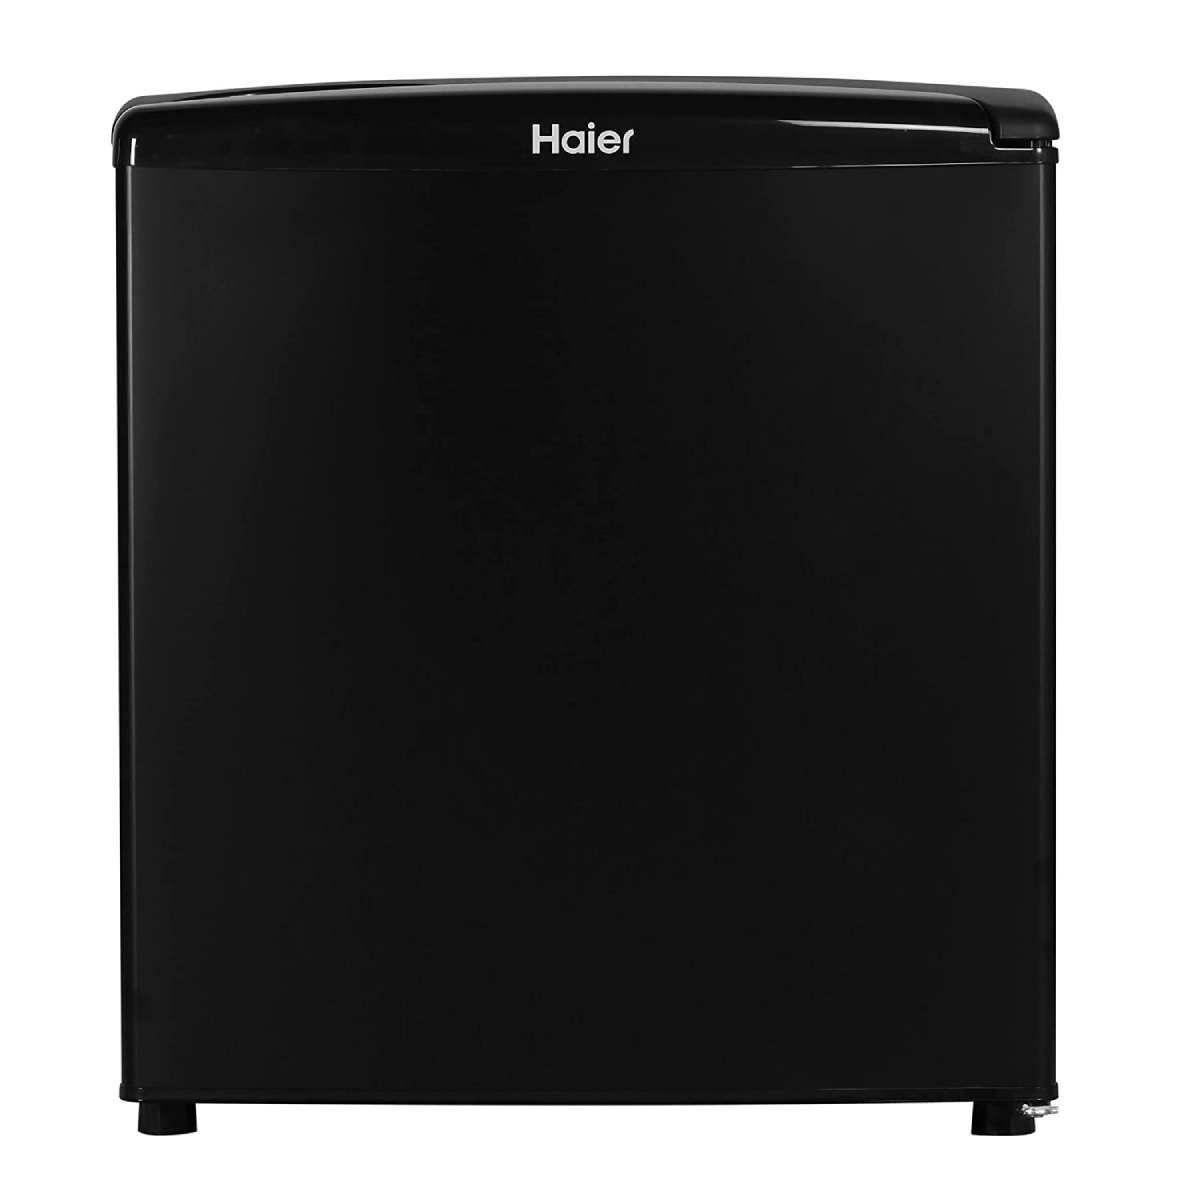 Haier 53 L 2 Star Direct-Cool Single Door Mini Refrigerator (HR-65KS)